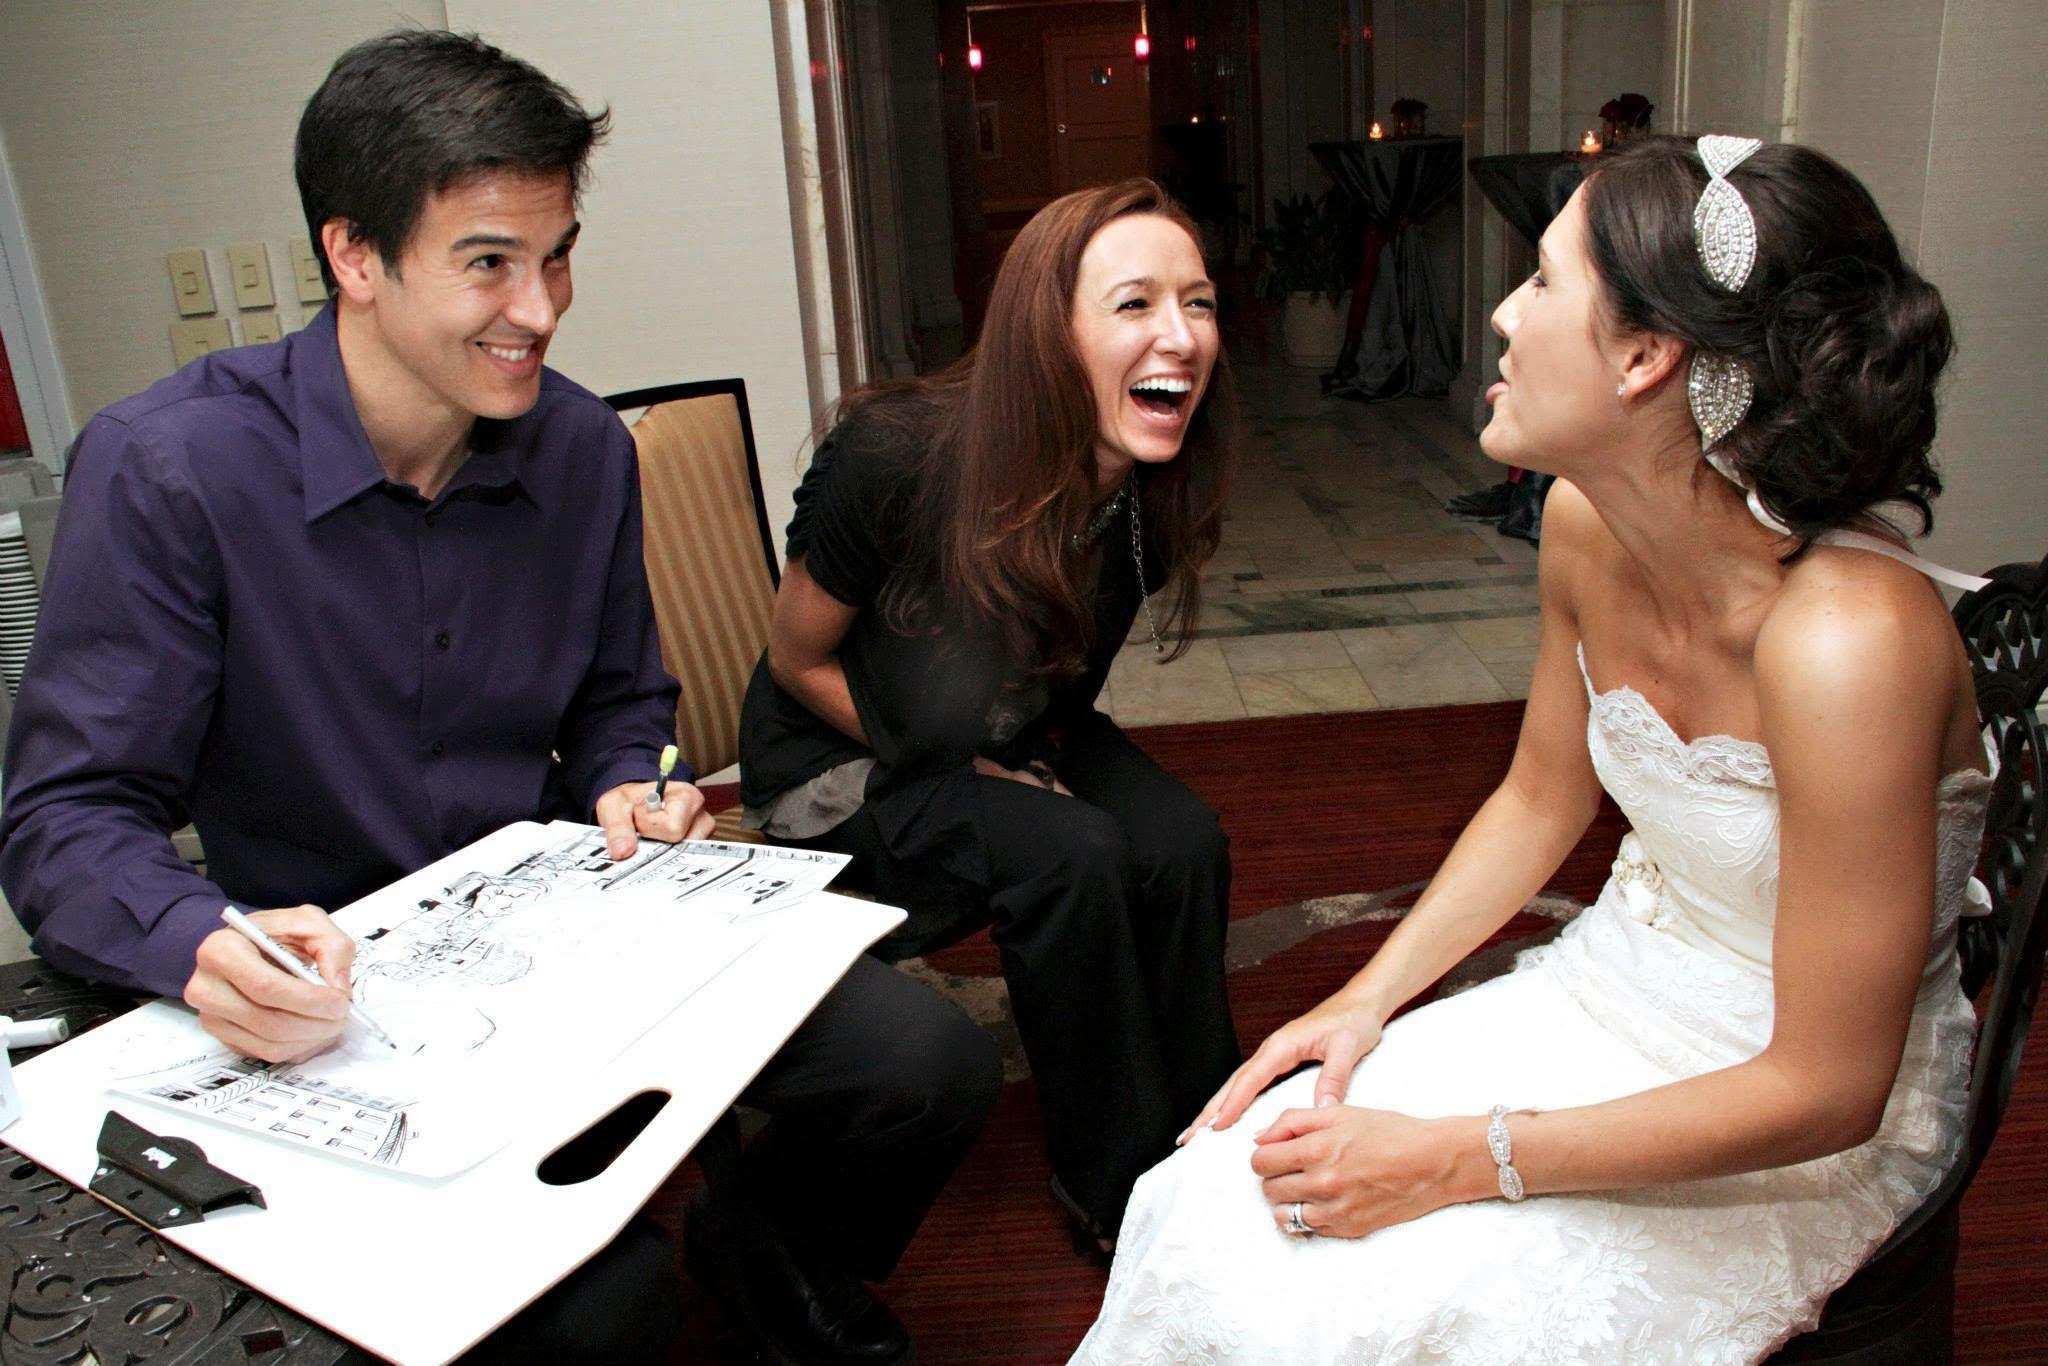 pa-wedding-entertainment-23.jpg